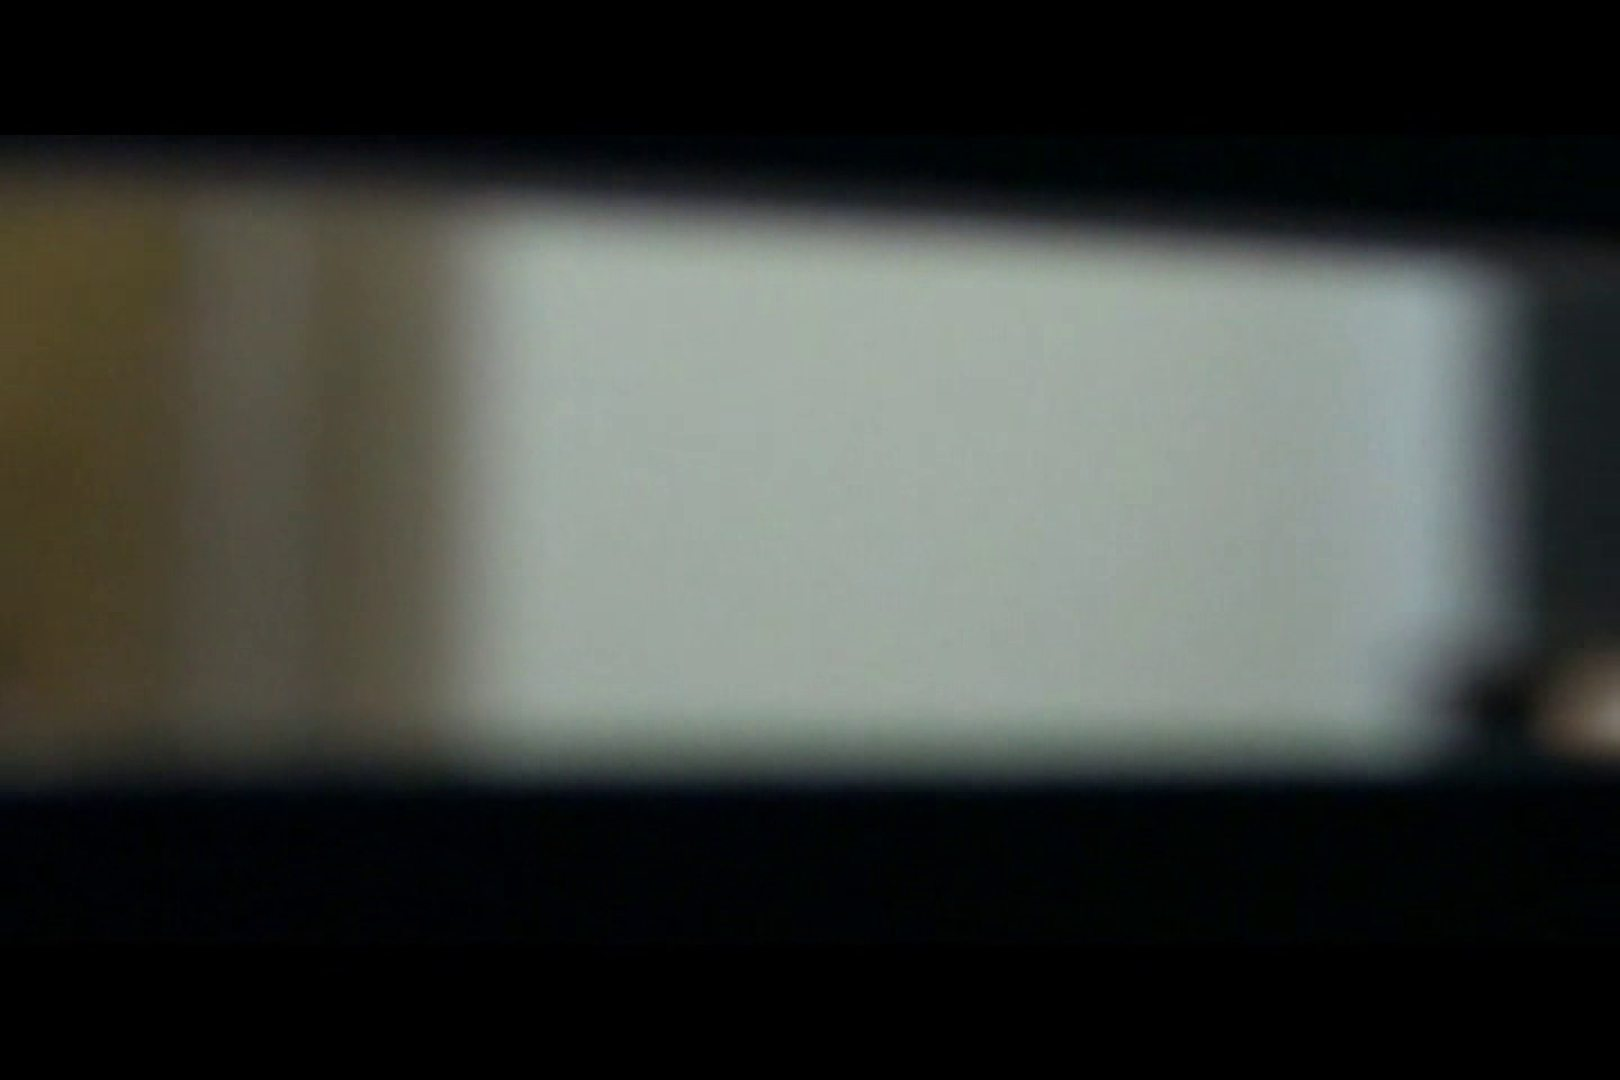 独占配信!無修正! 看護女子寮 vol.05 女子寮隠し撮り 性交動画流出 86pic 35